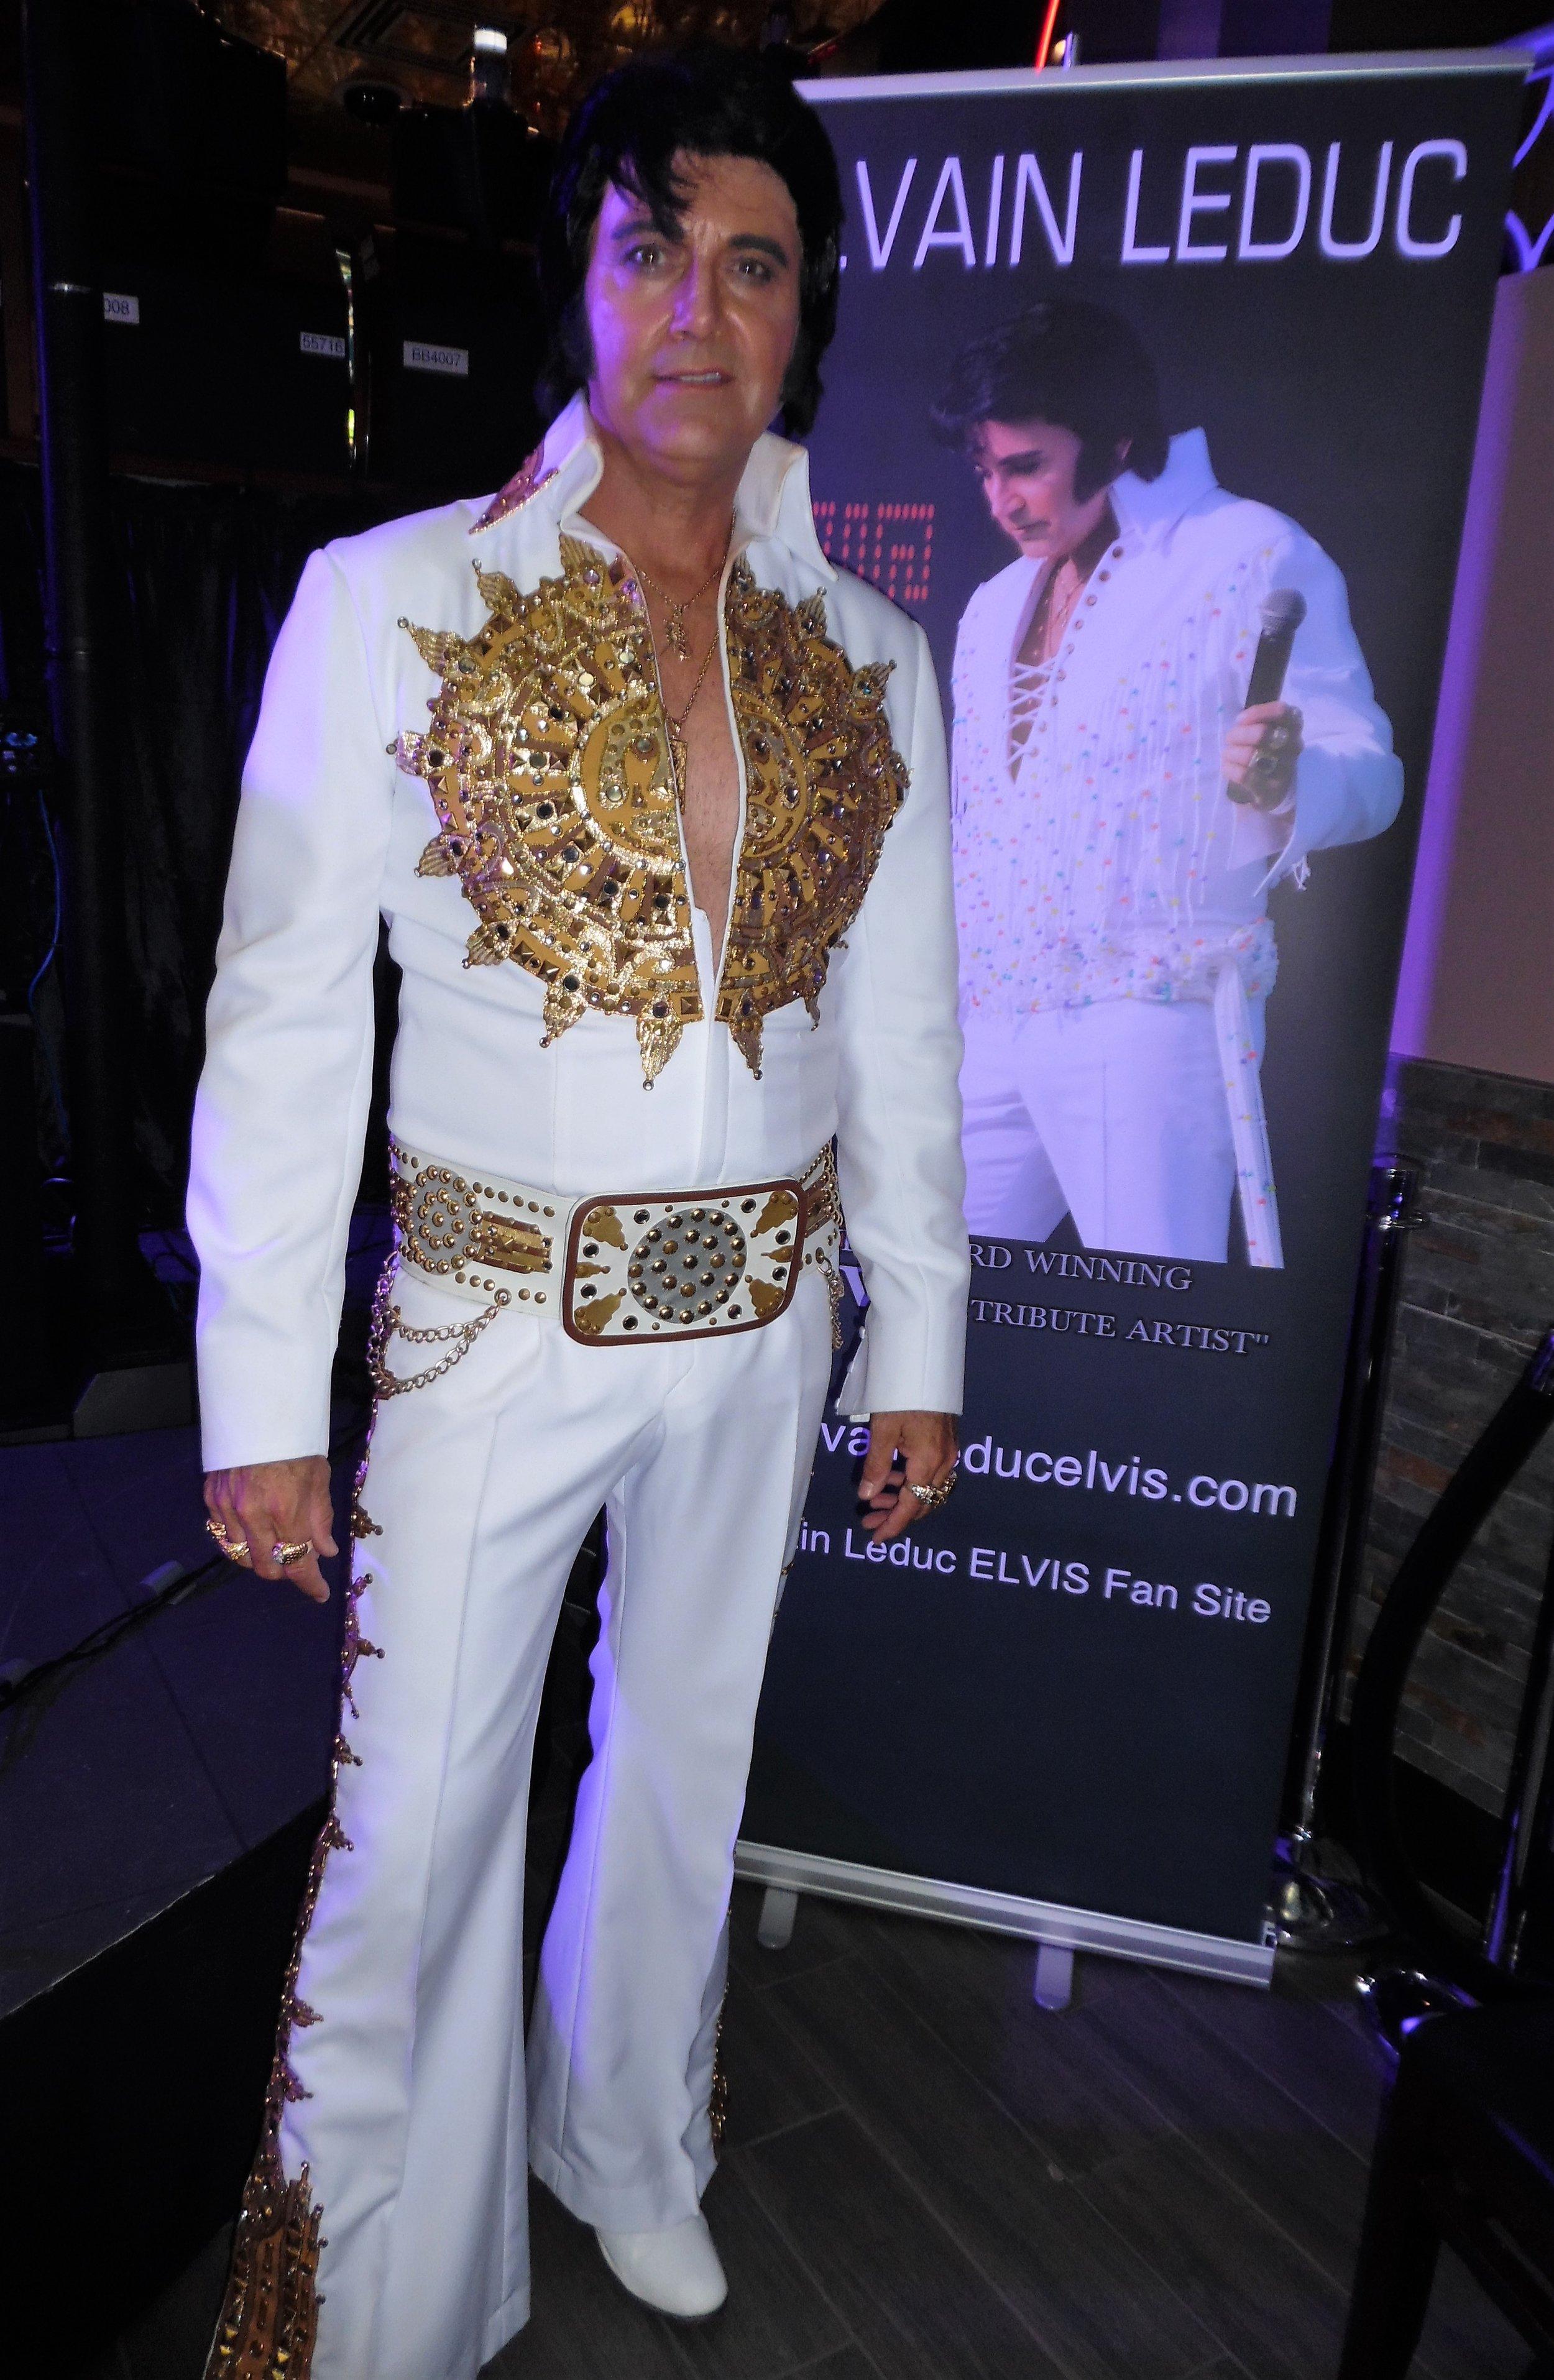 ETA  Sylvain Leduc  after Flamboro Downs concert, Flamborough, ON September 29th, 2017